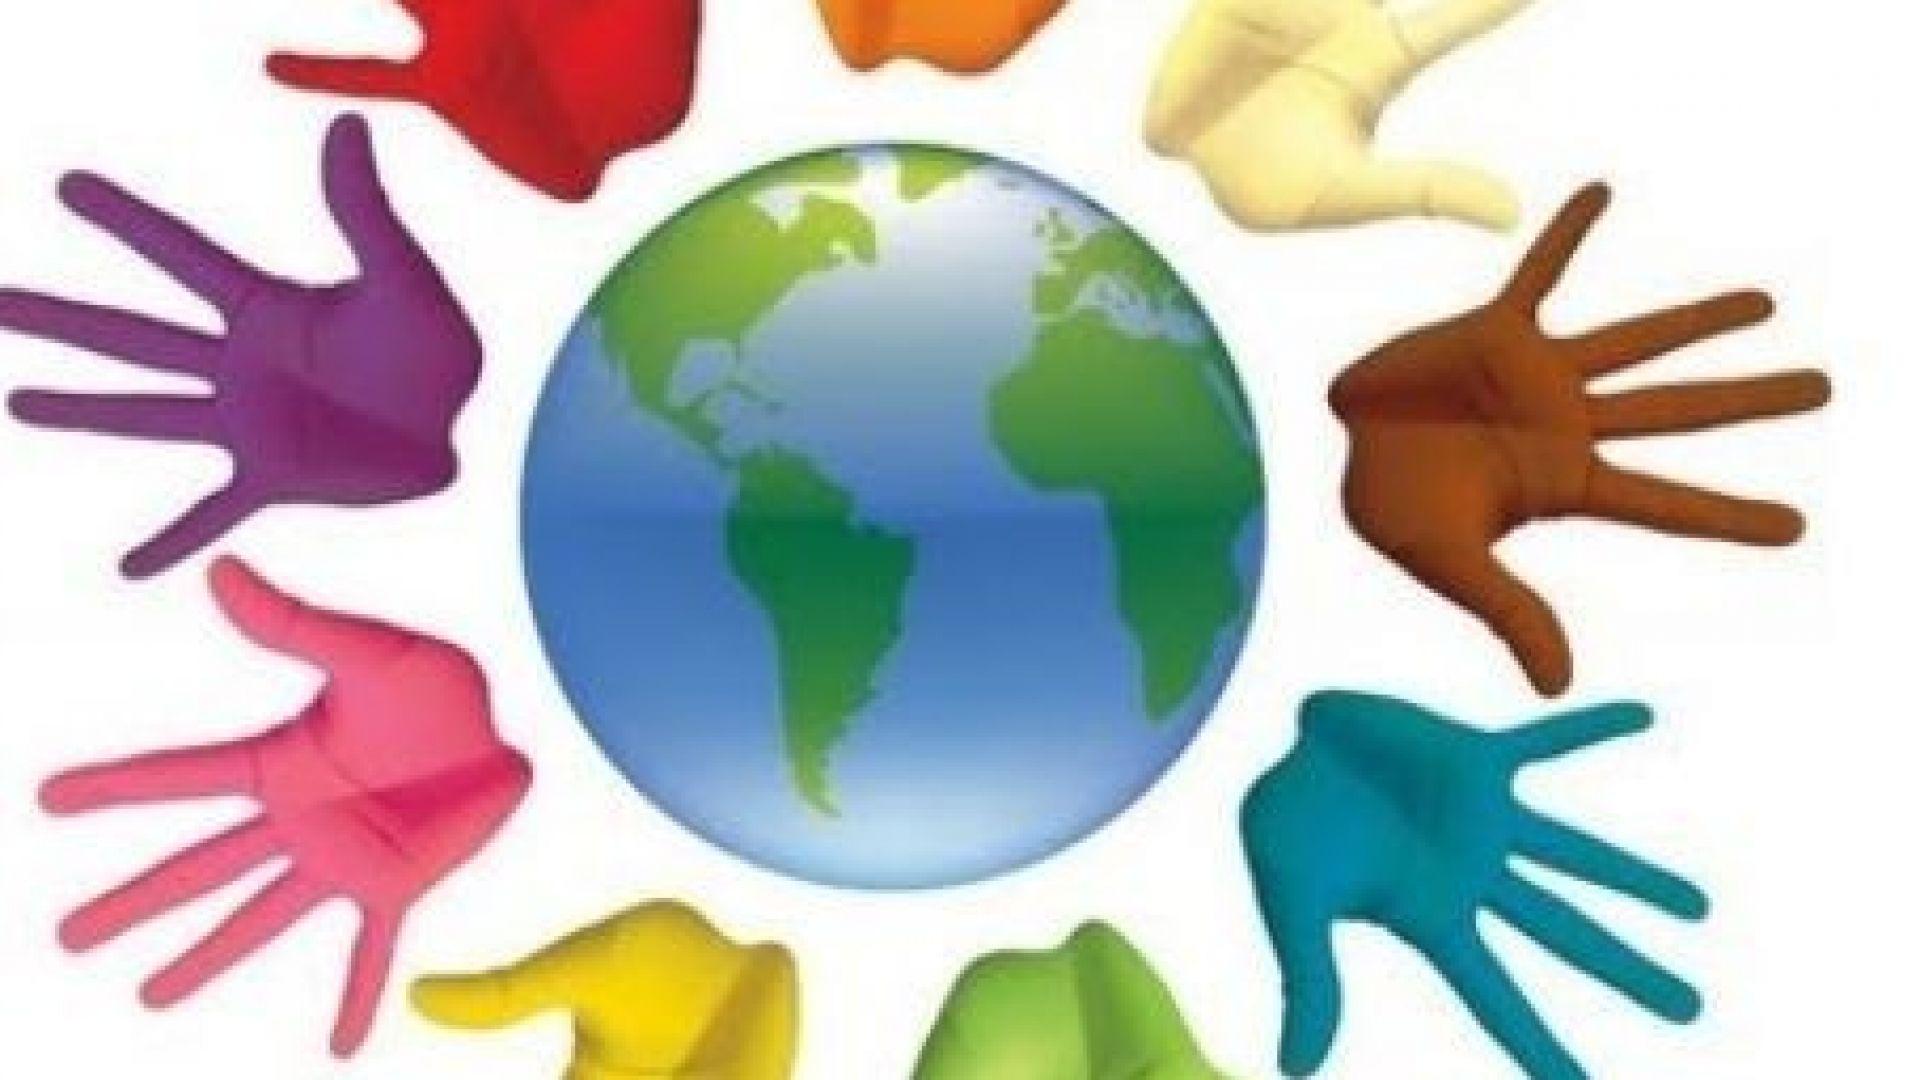 Детски празник по случай Международния ден на толерантността организира на